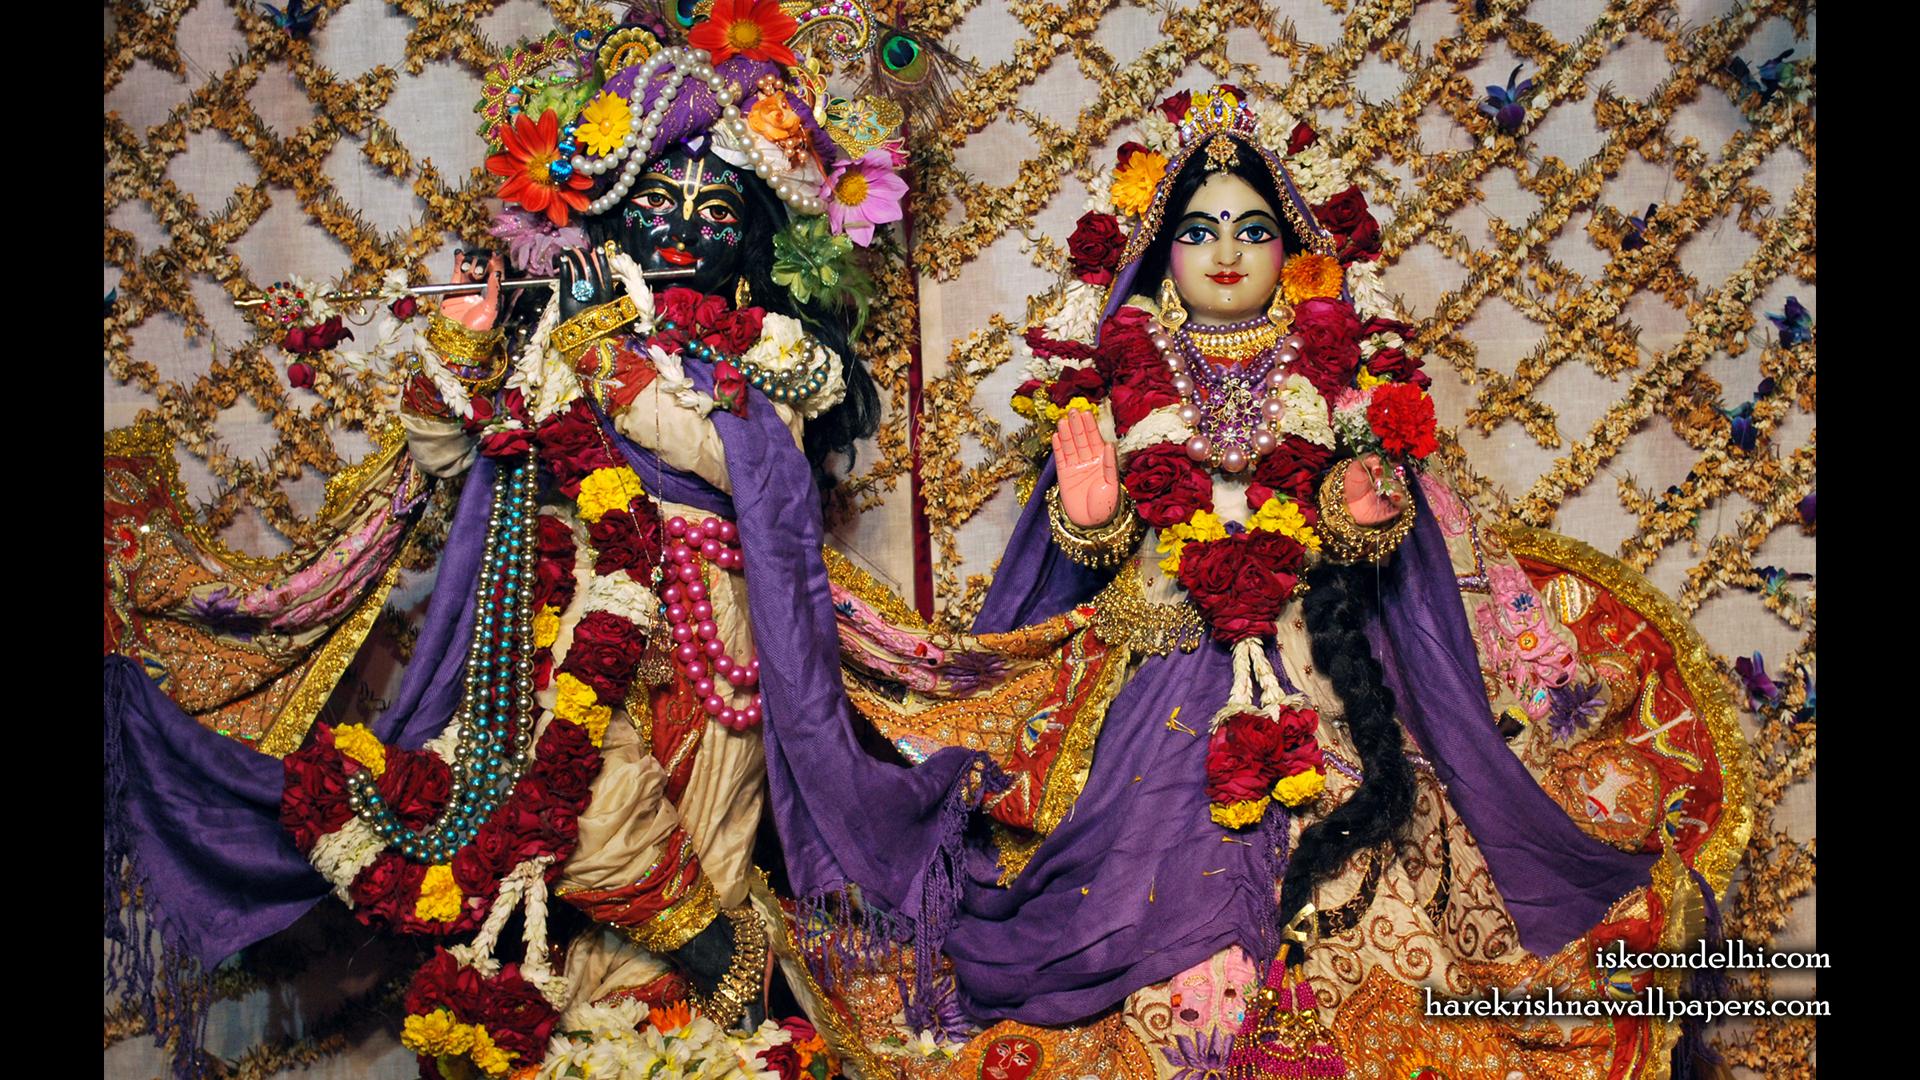 Sri Sri Radha Parthasarathi Wallpaper (005) Size 1920x1080 Download